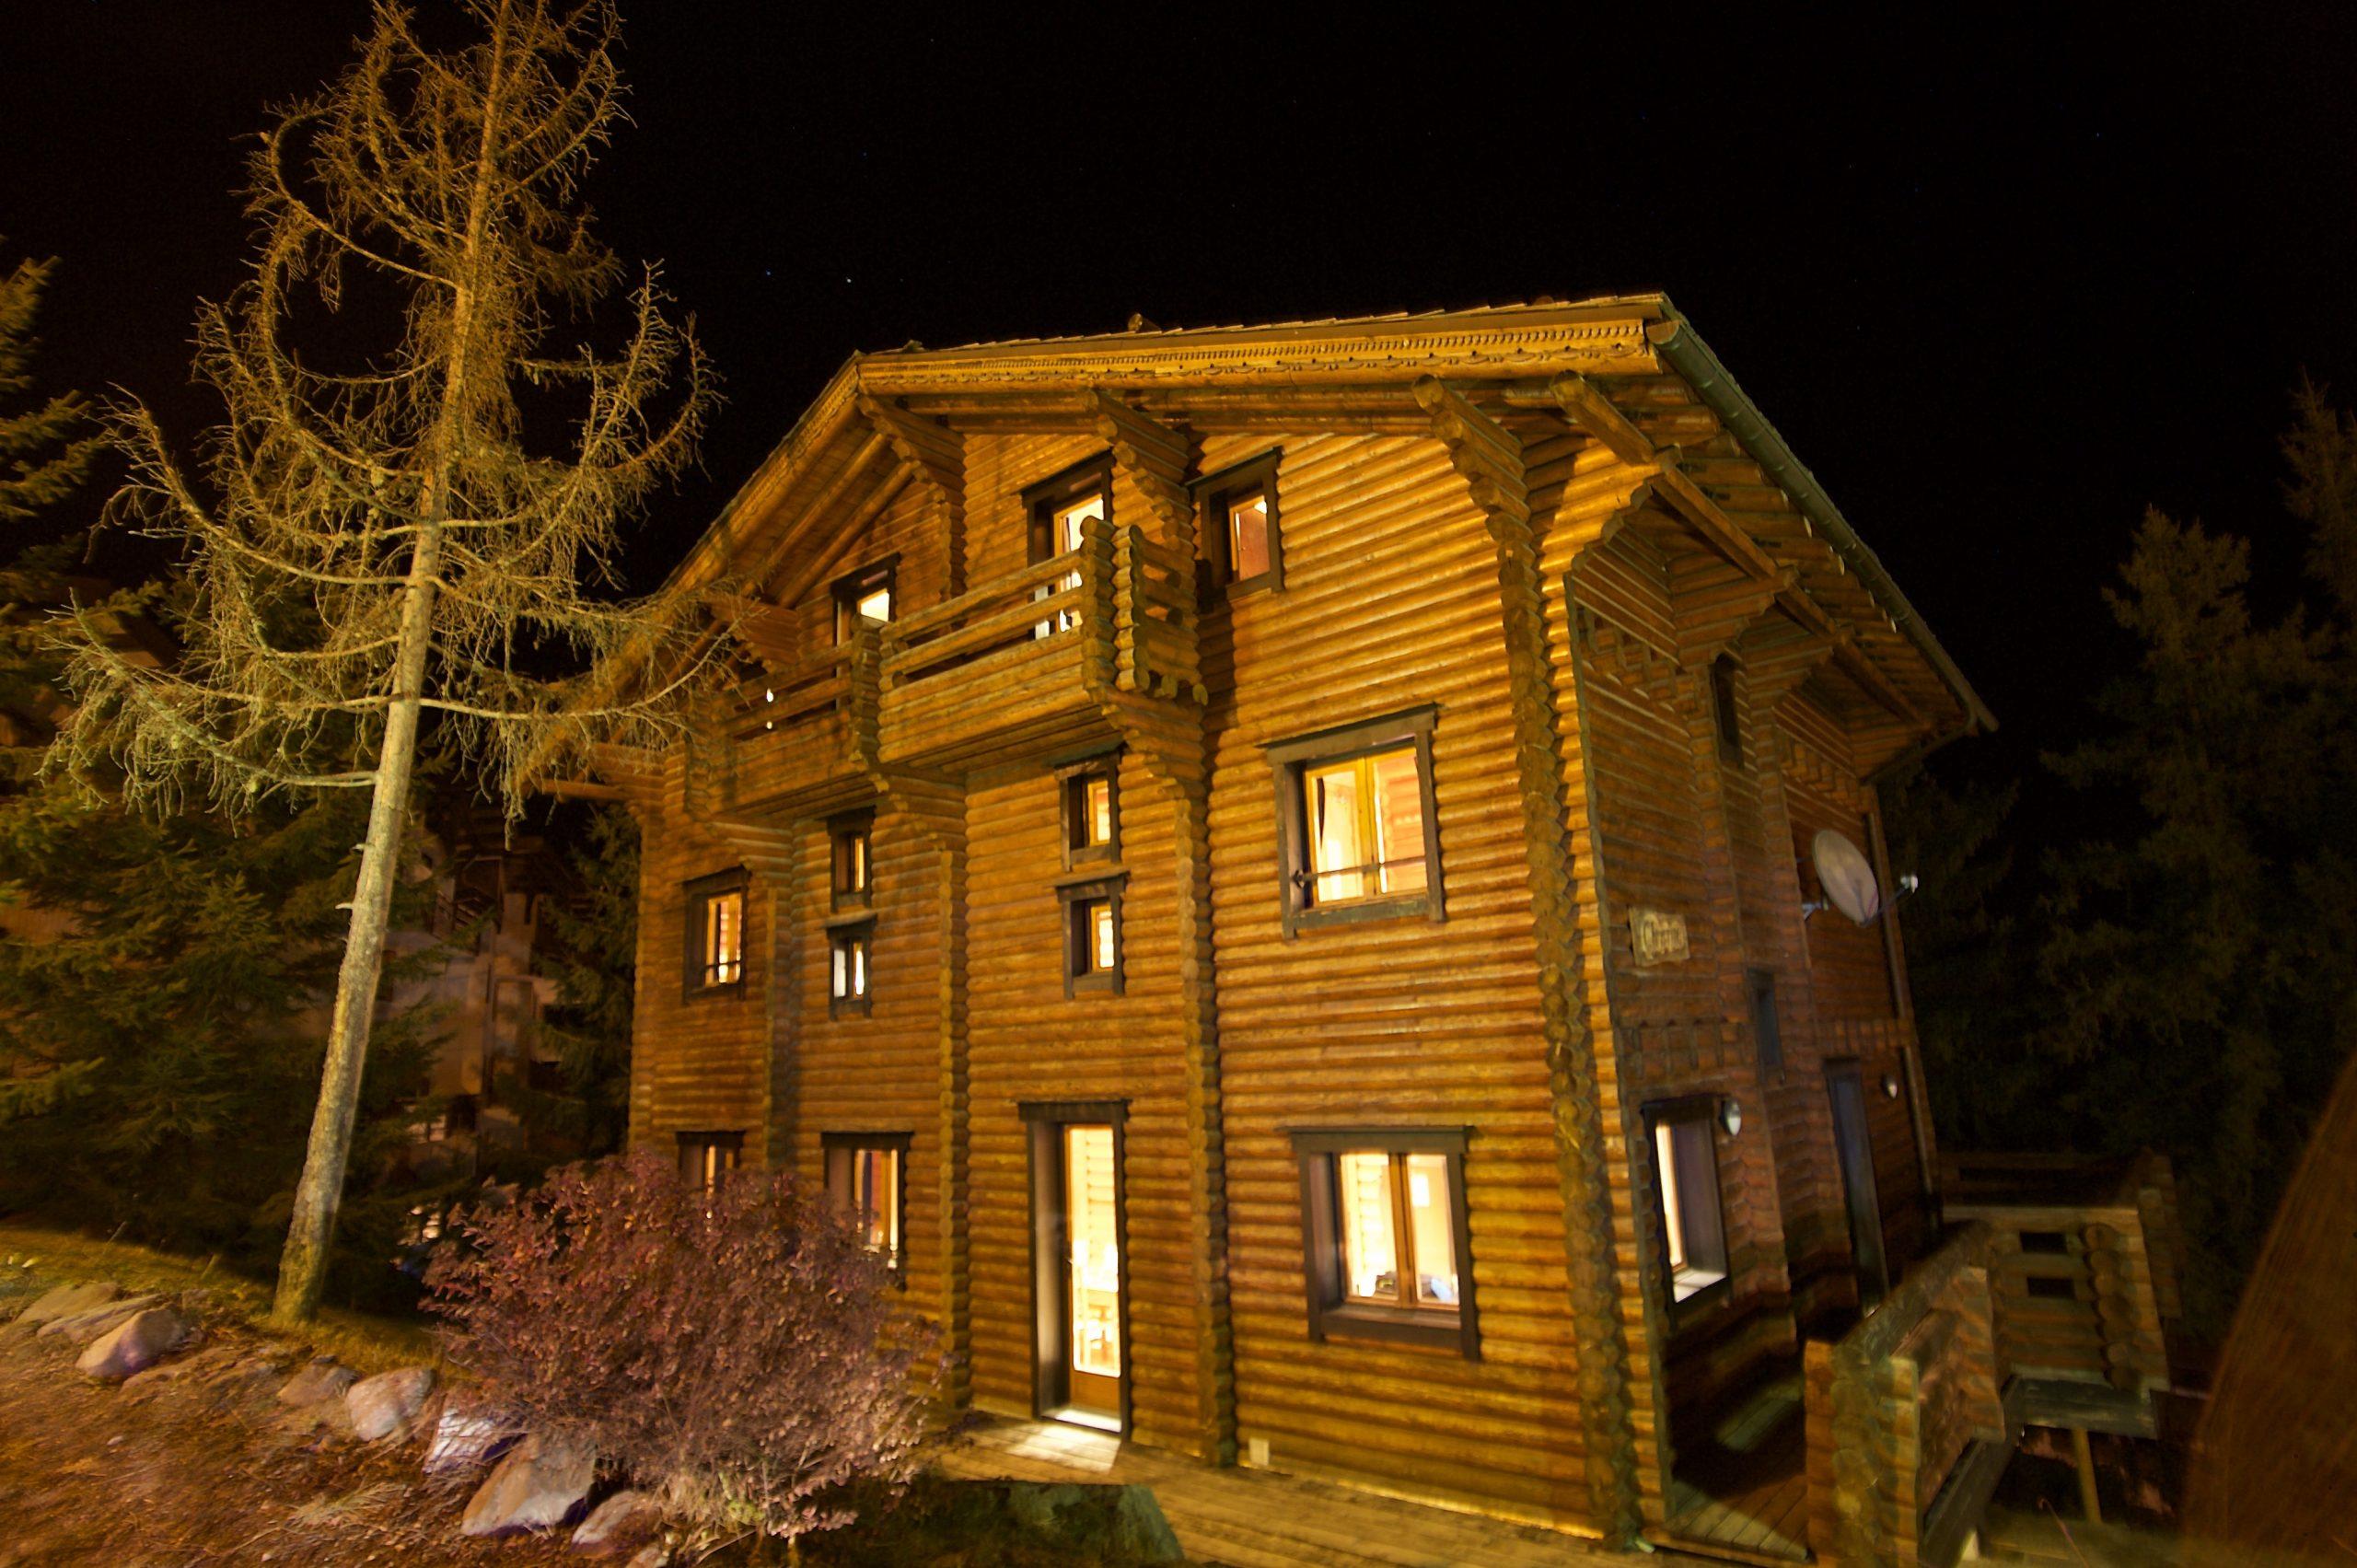 chalet at night